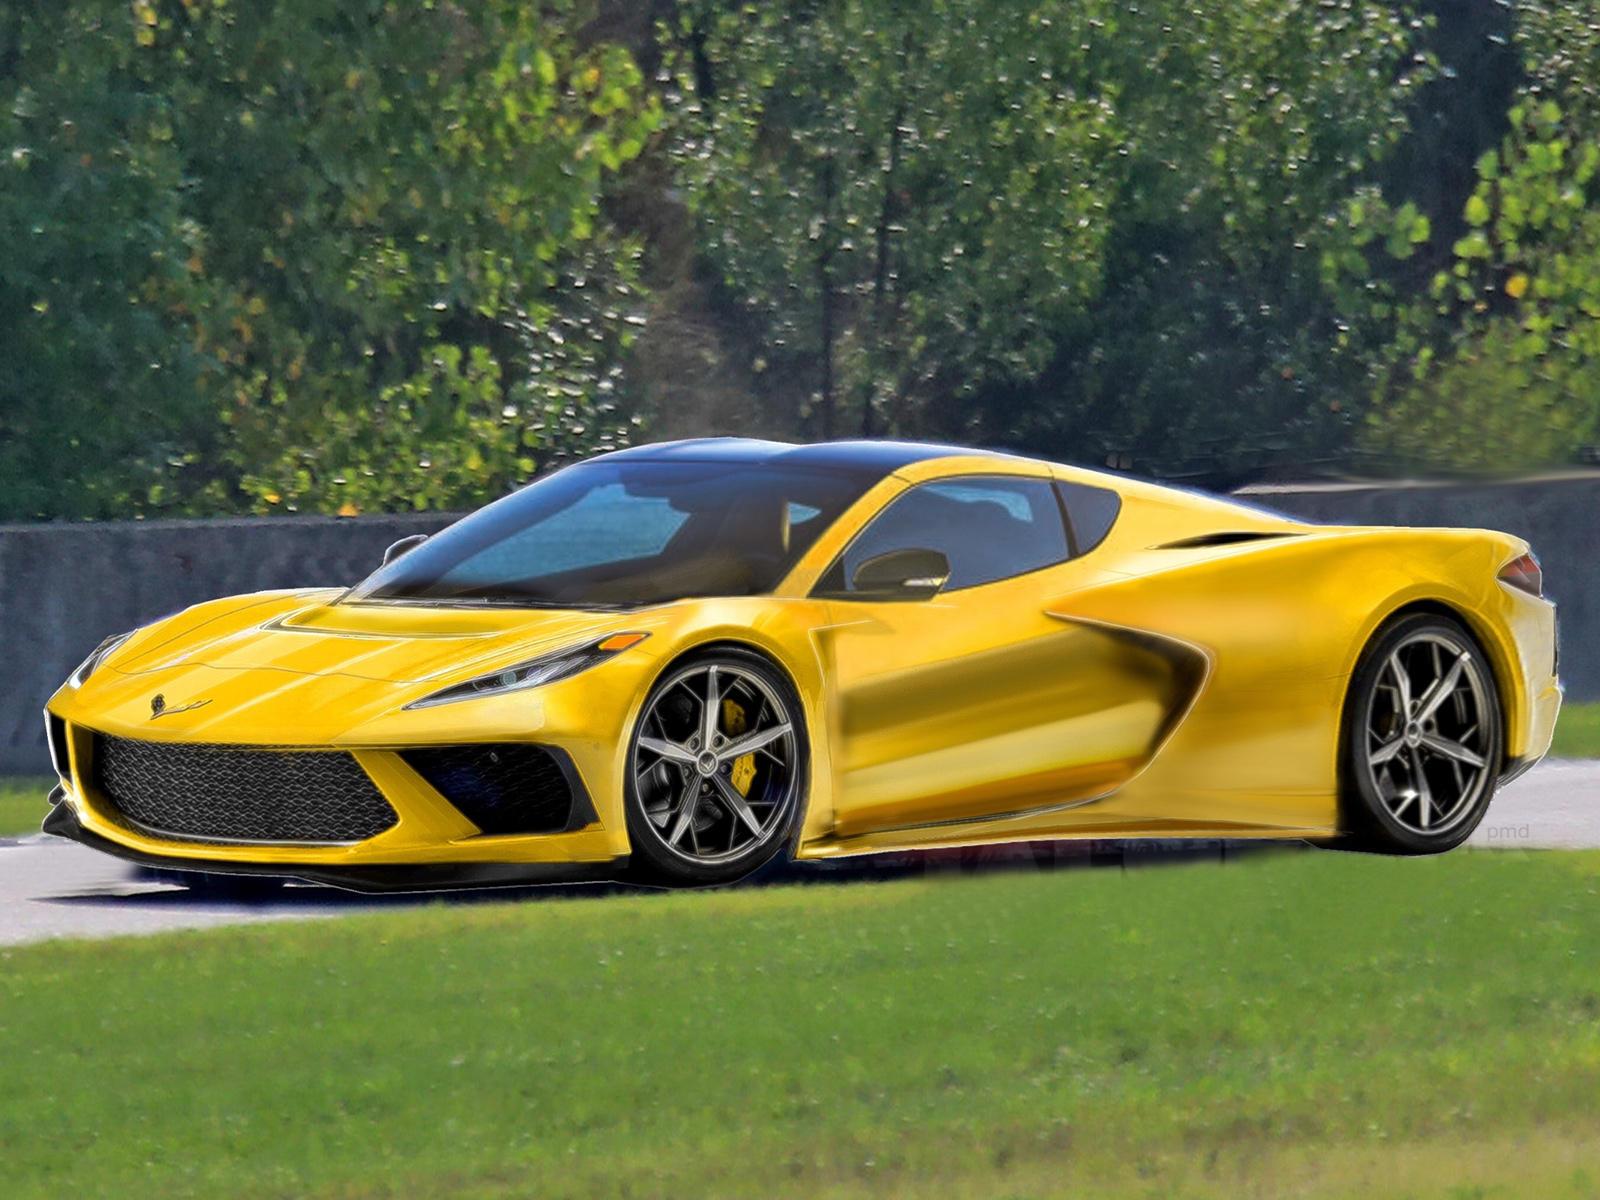 Hd Wallpaper Hd Wallpaper C8 Corvette